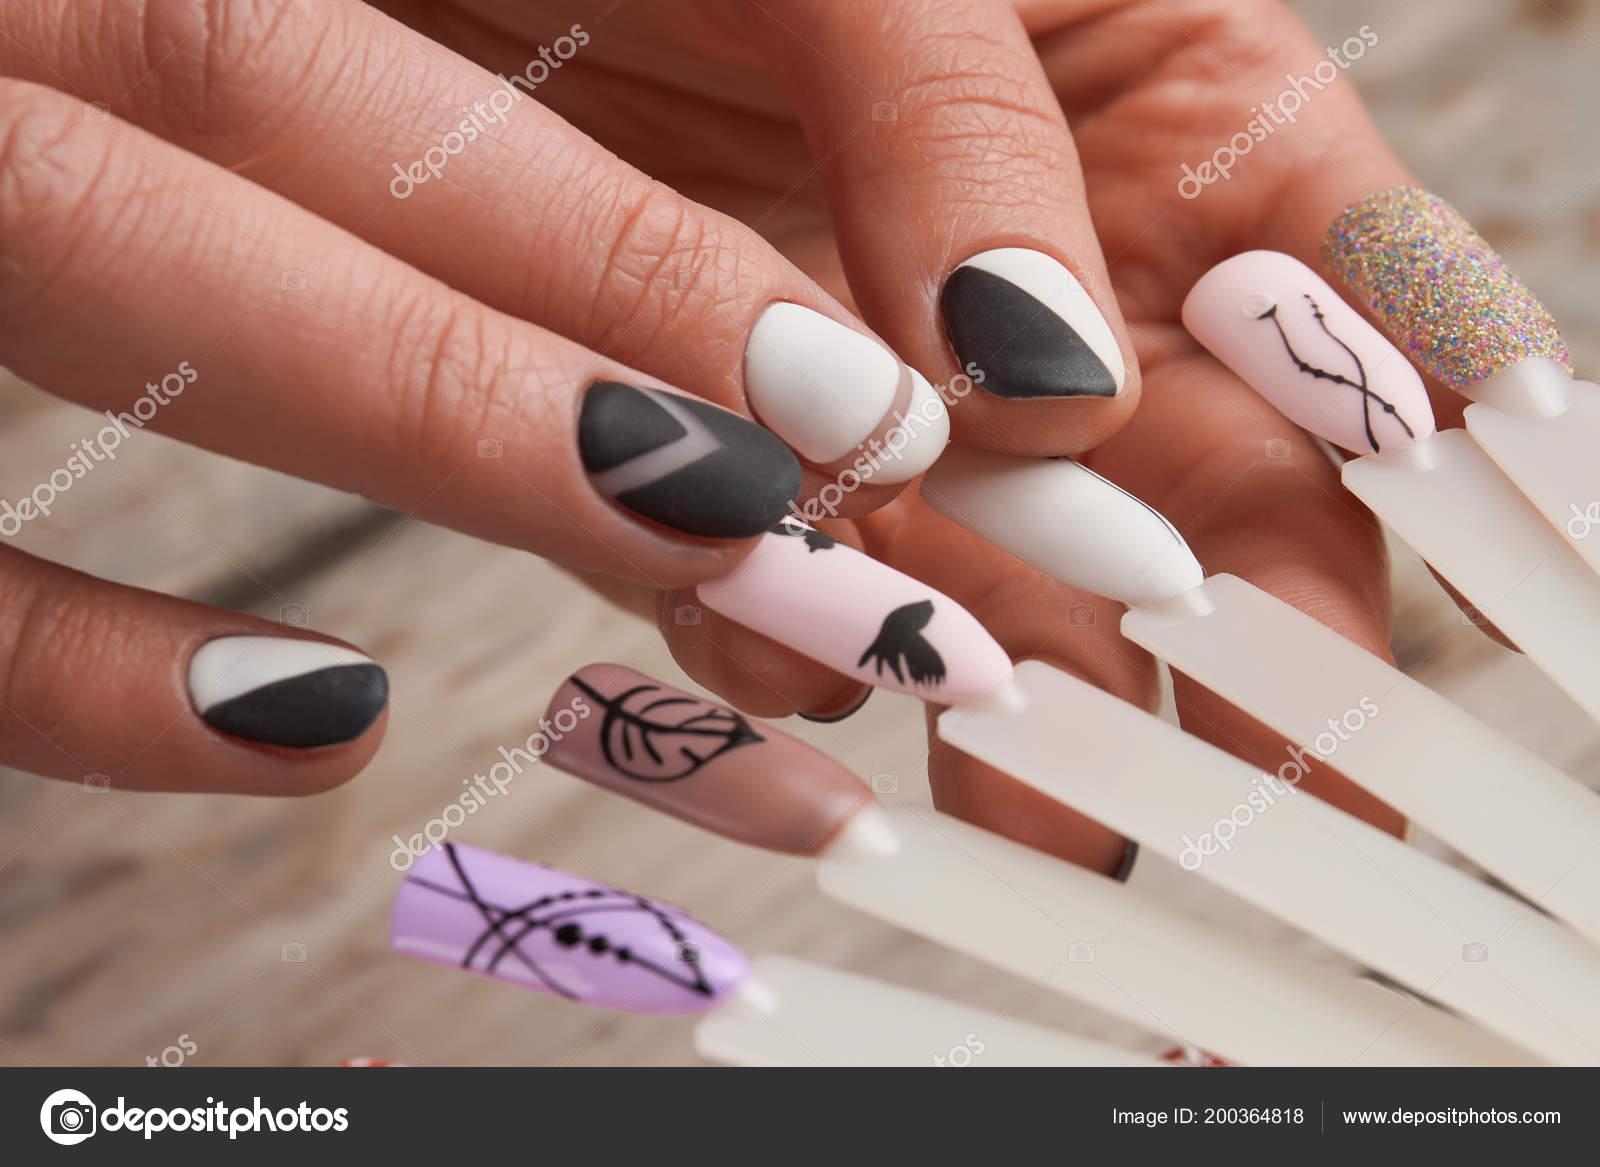 Nail Art Samples In Female Hands Stock Photo Denisfilm 200364818